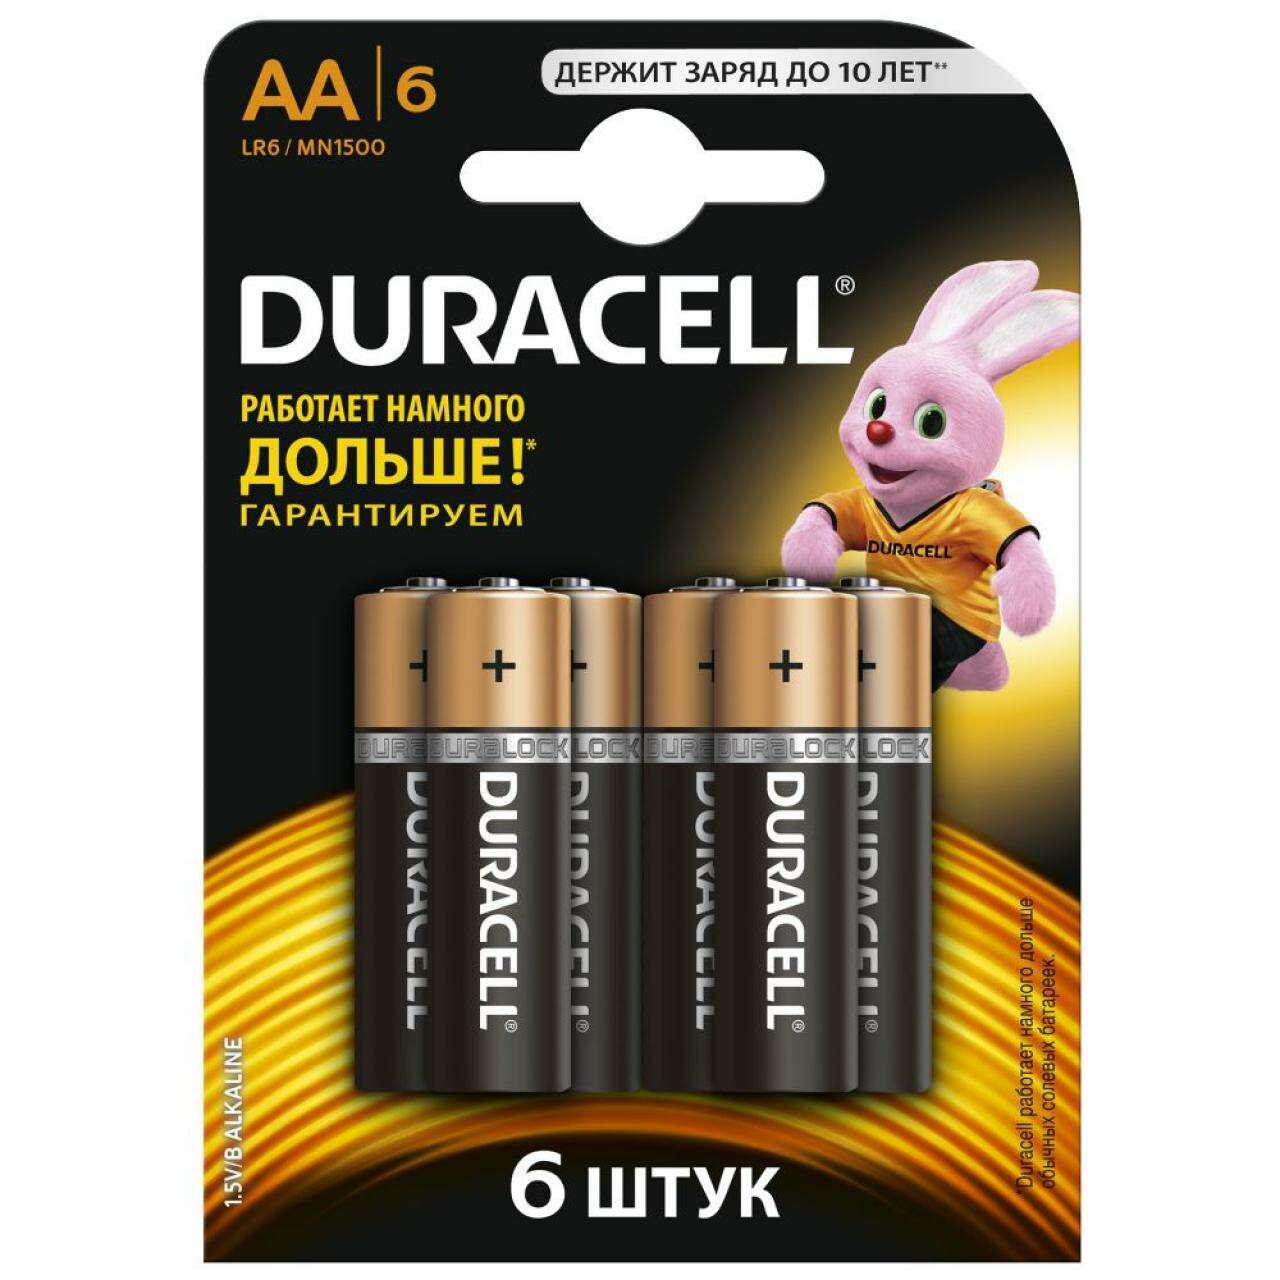 Батарейка Duracell Basic ААх6